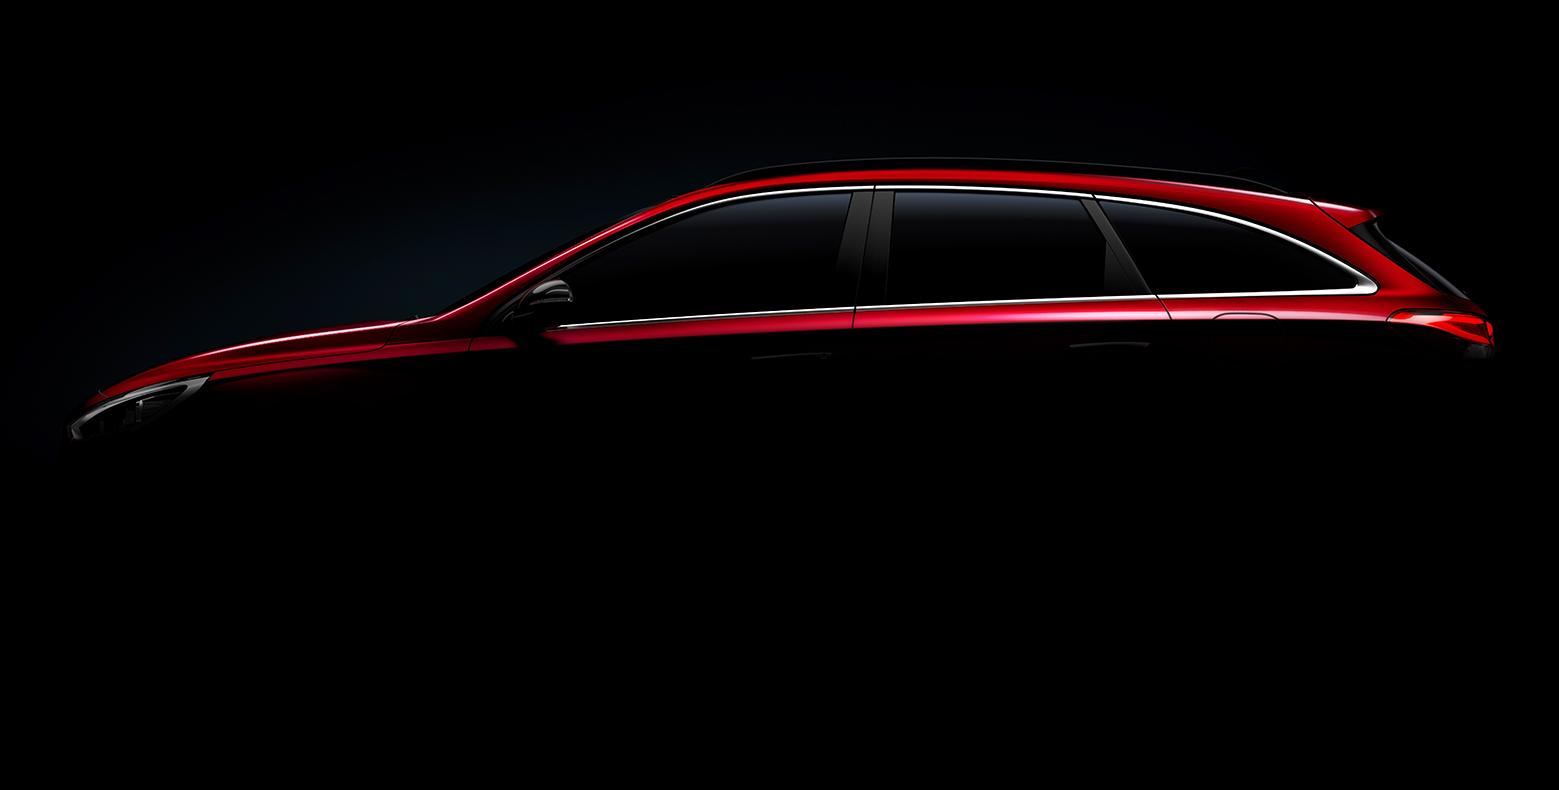 Nuova Hyundai i30 wagon, il primo teaser